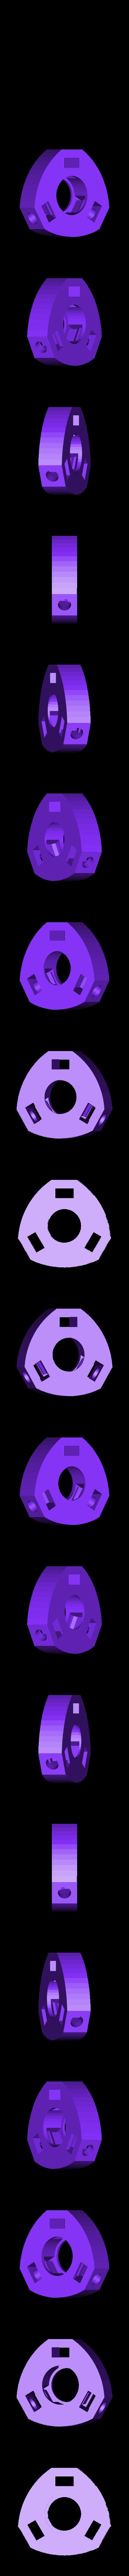 Spool1.STL Télécharger fichier STL gratuit Bobine • Objet à imprimer en 3D, billythemighty3Dprinter